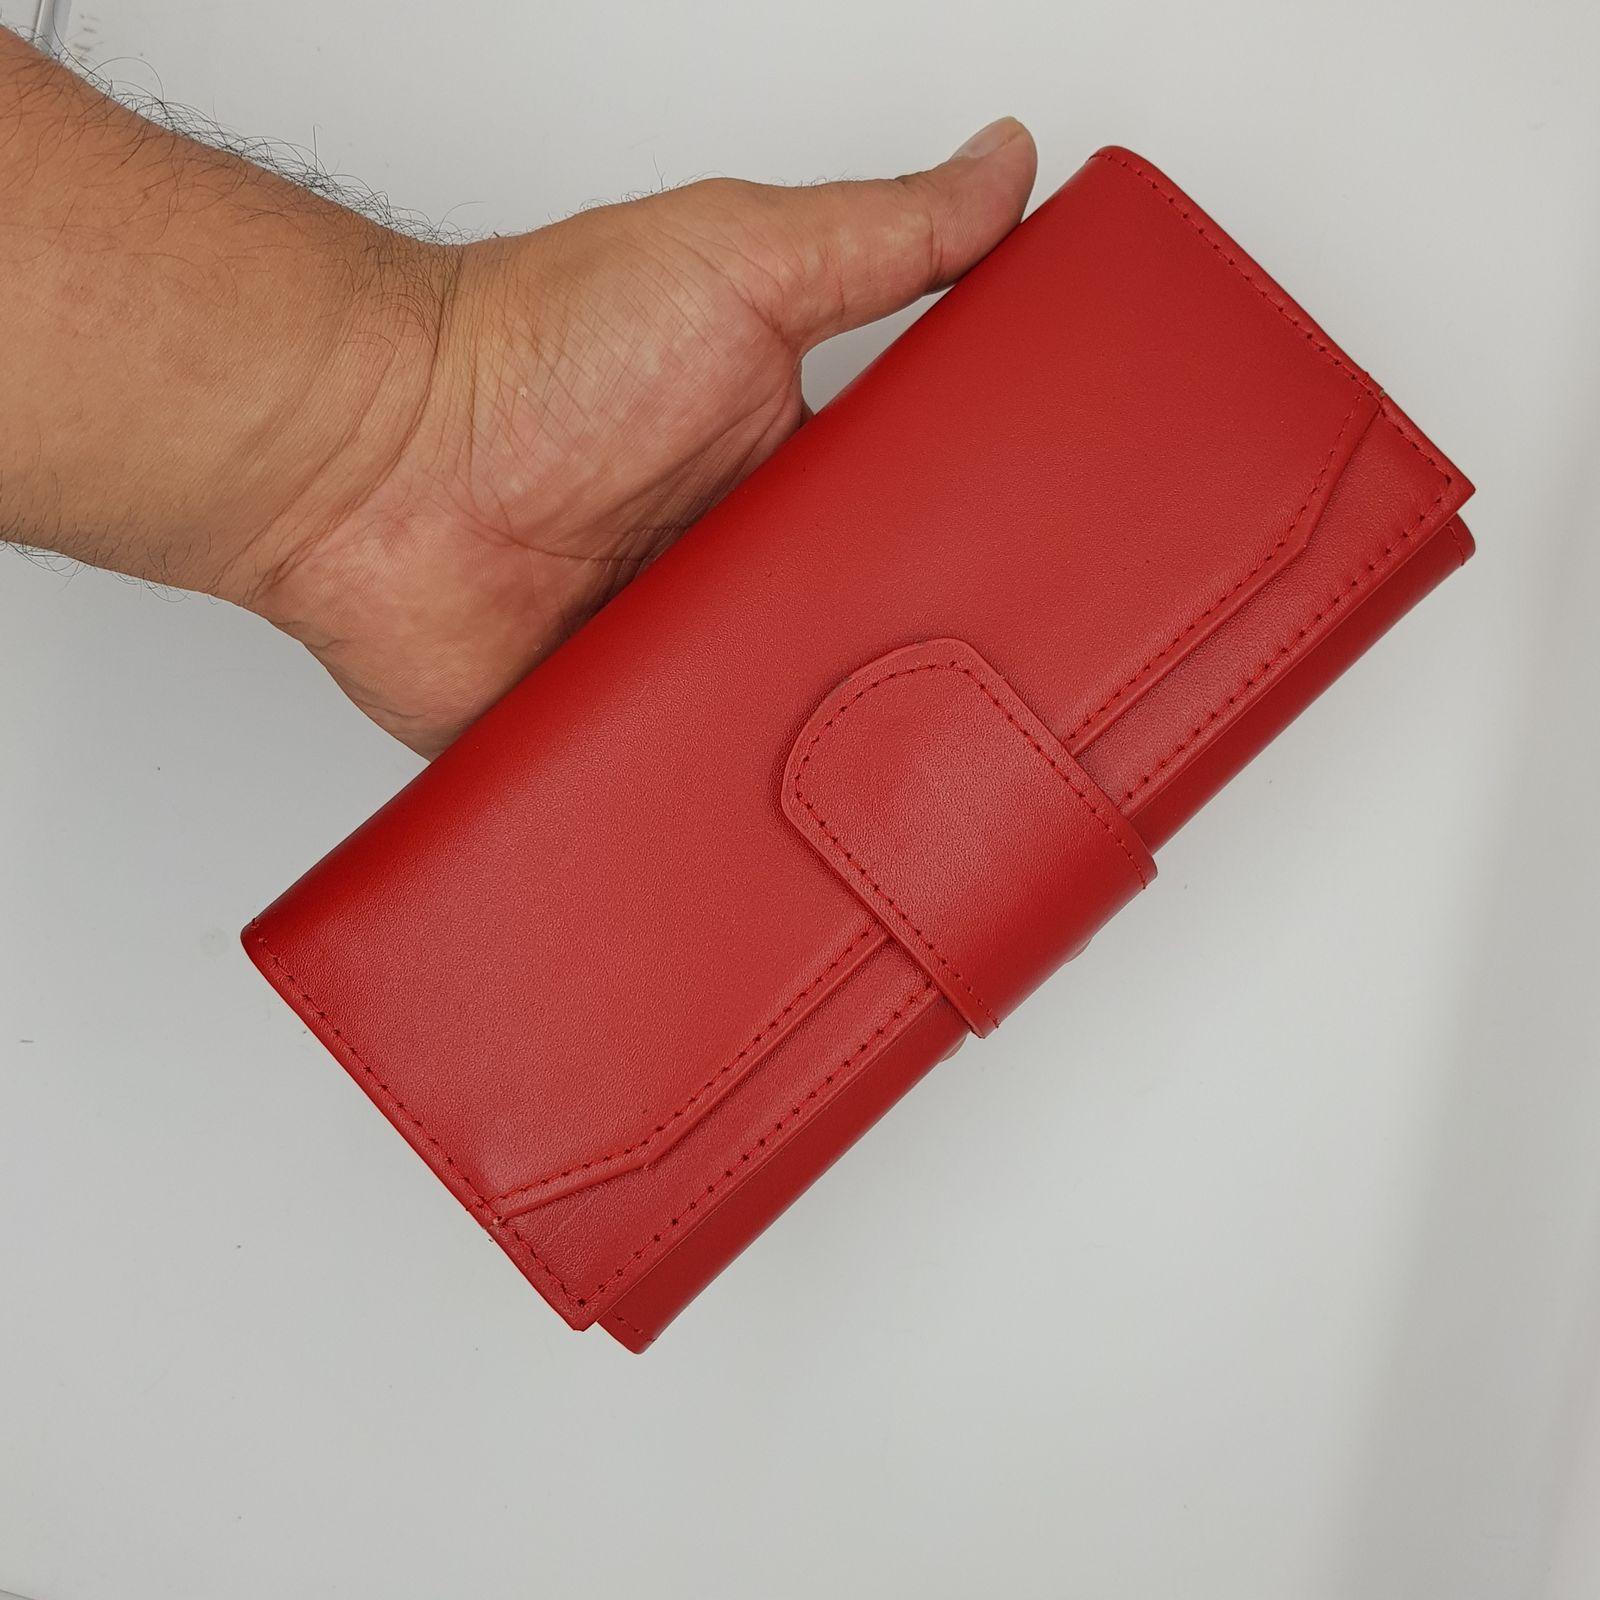 کیف پول زنانه چرم دیاکو مدل 315 -  - 12